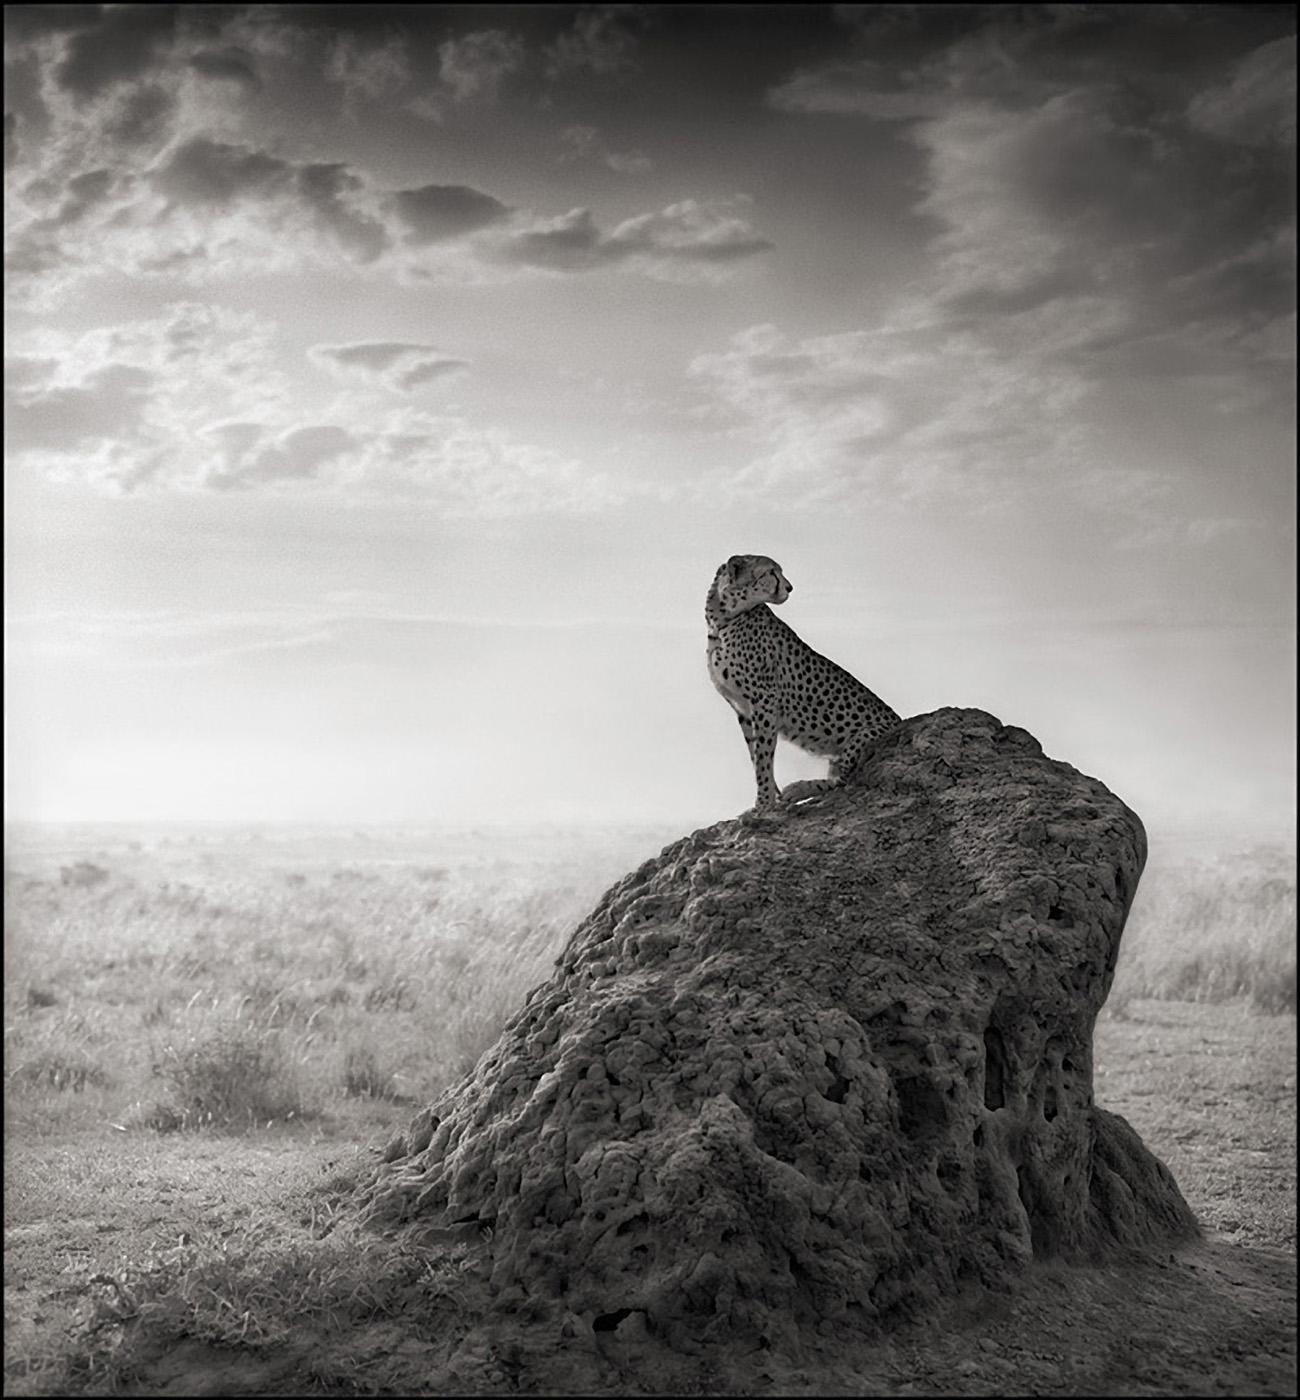 Cheetah on Termite Mound, Maasai Mara, 2008